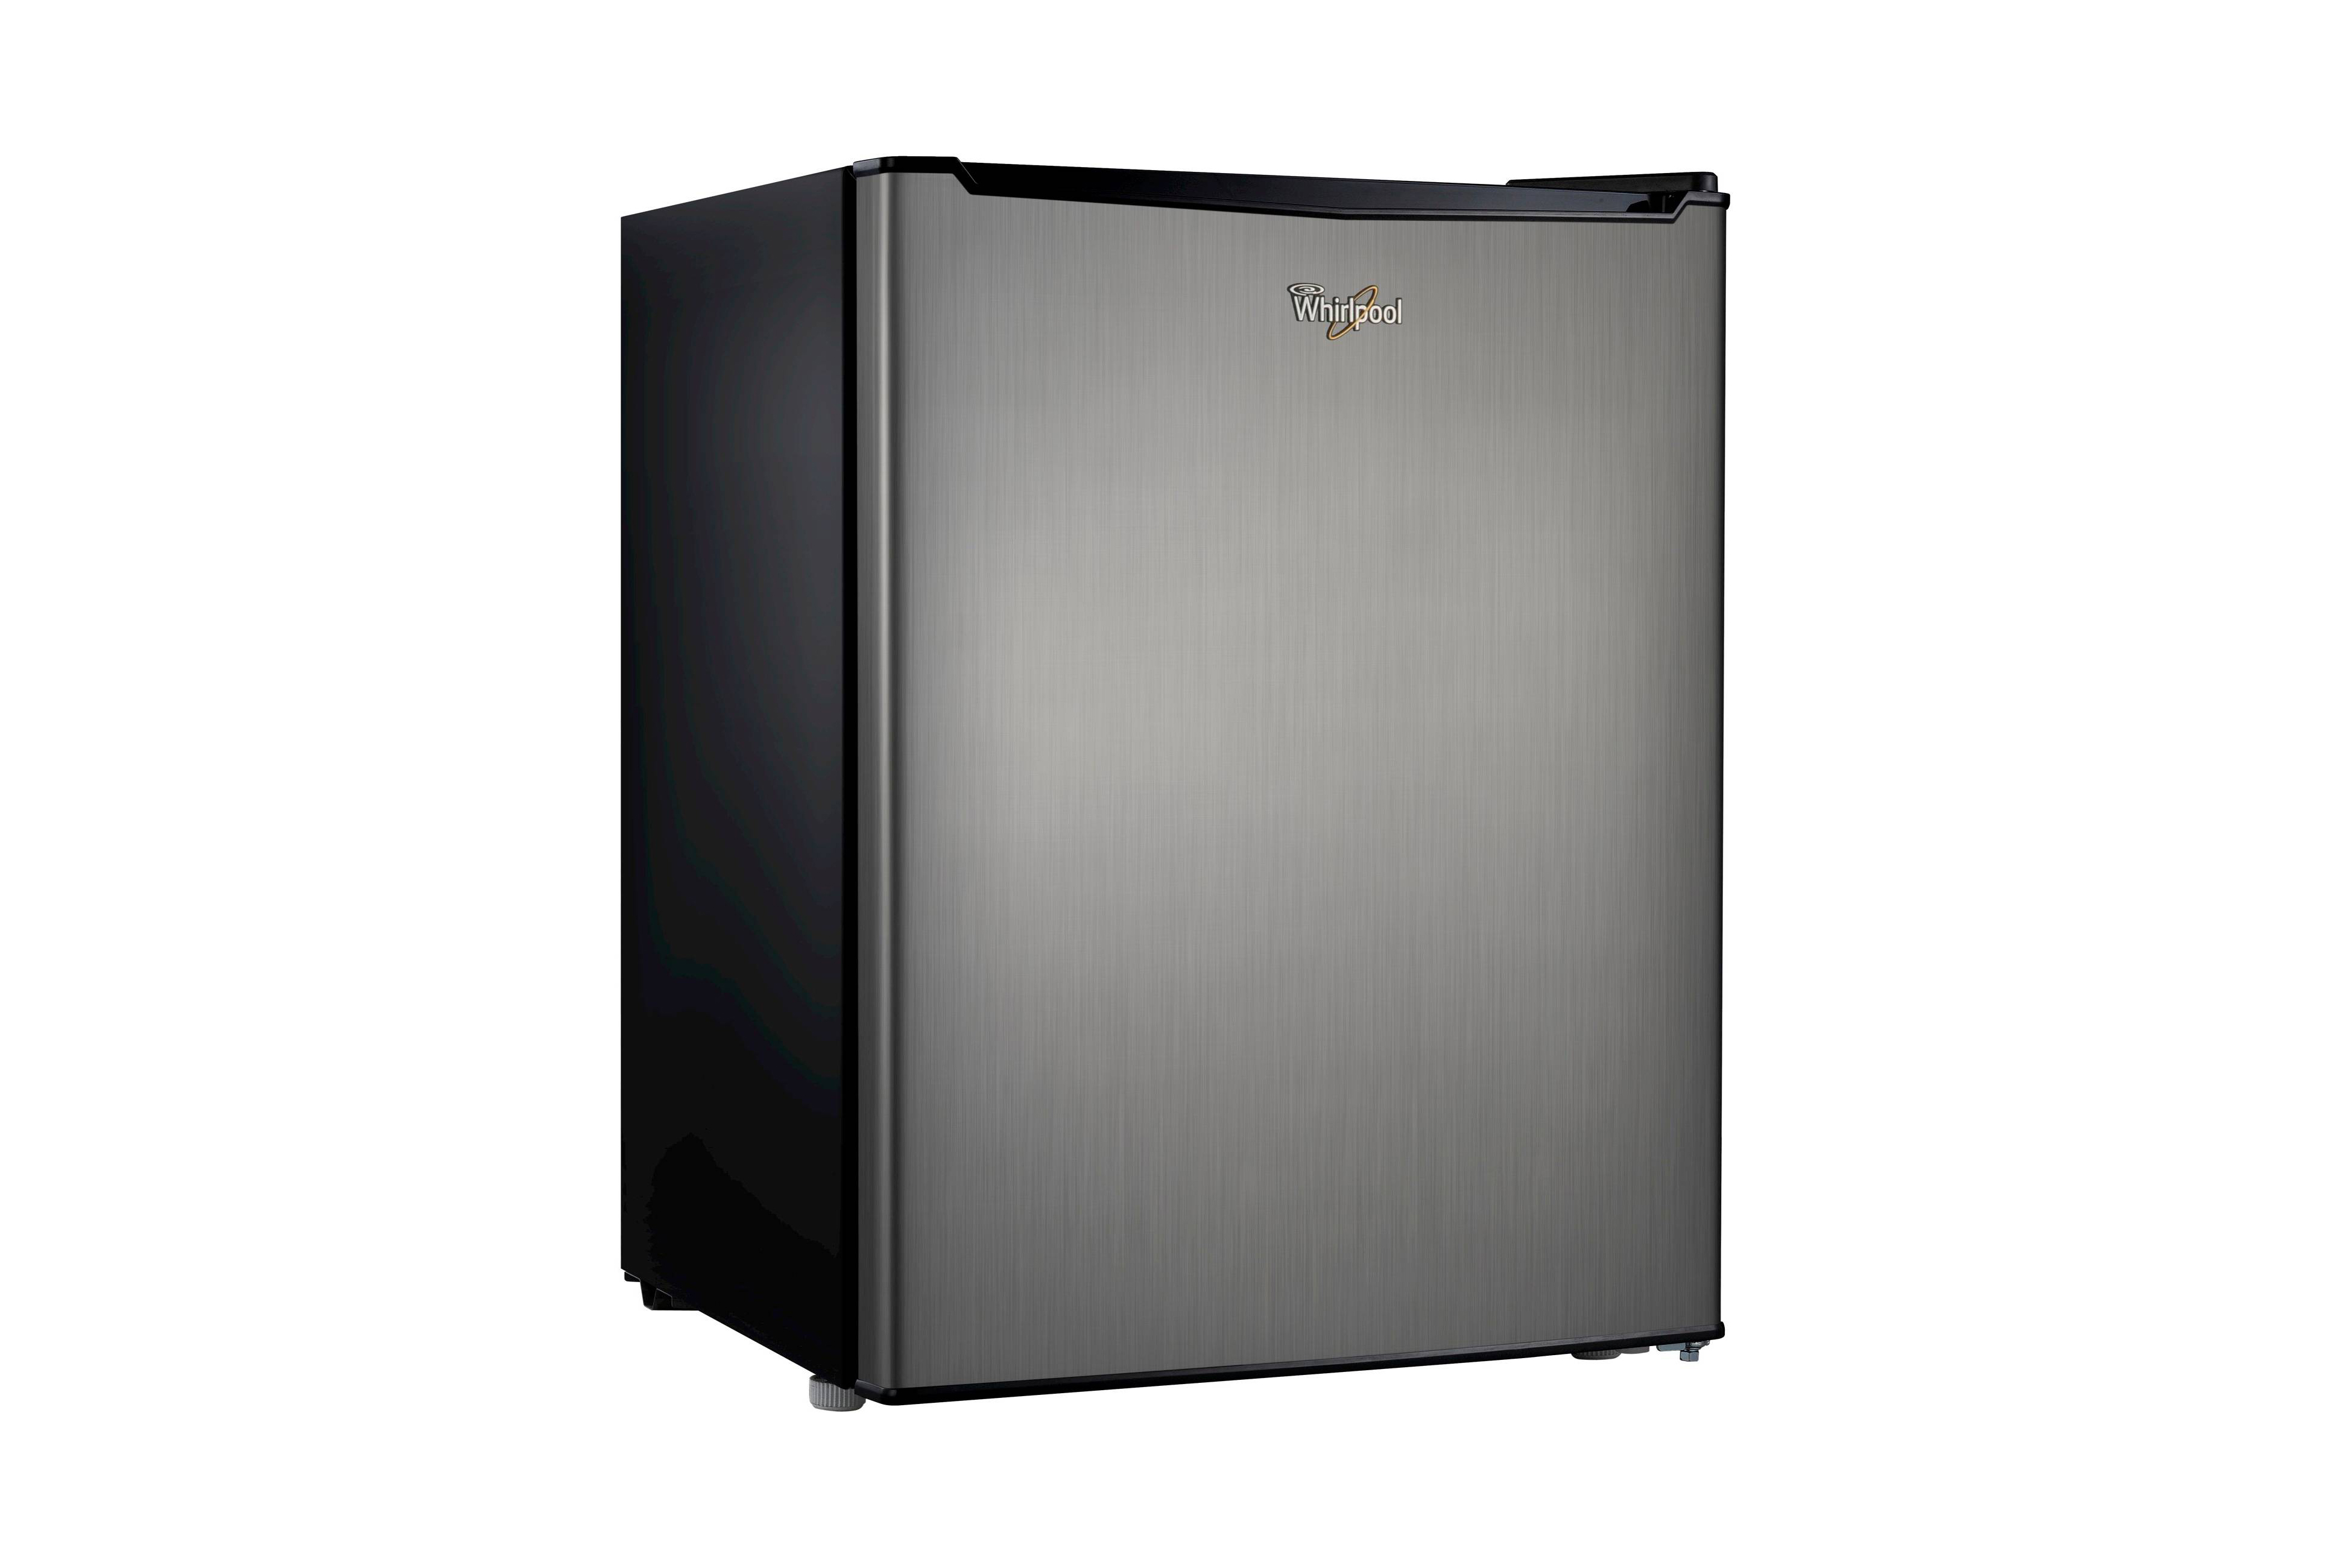 171110-target-black-friday-savings-mini-fridge